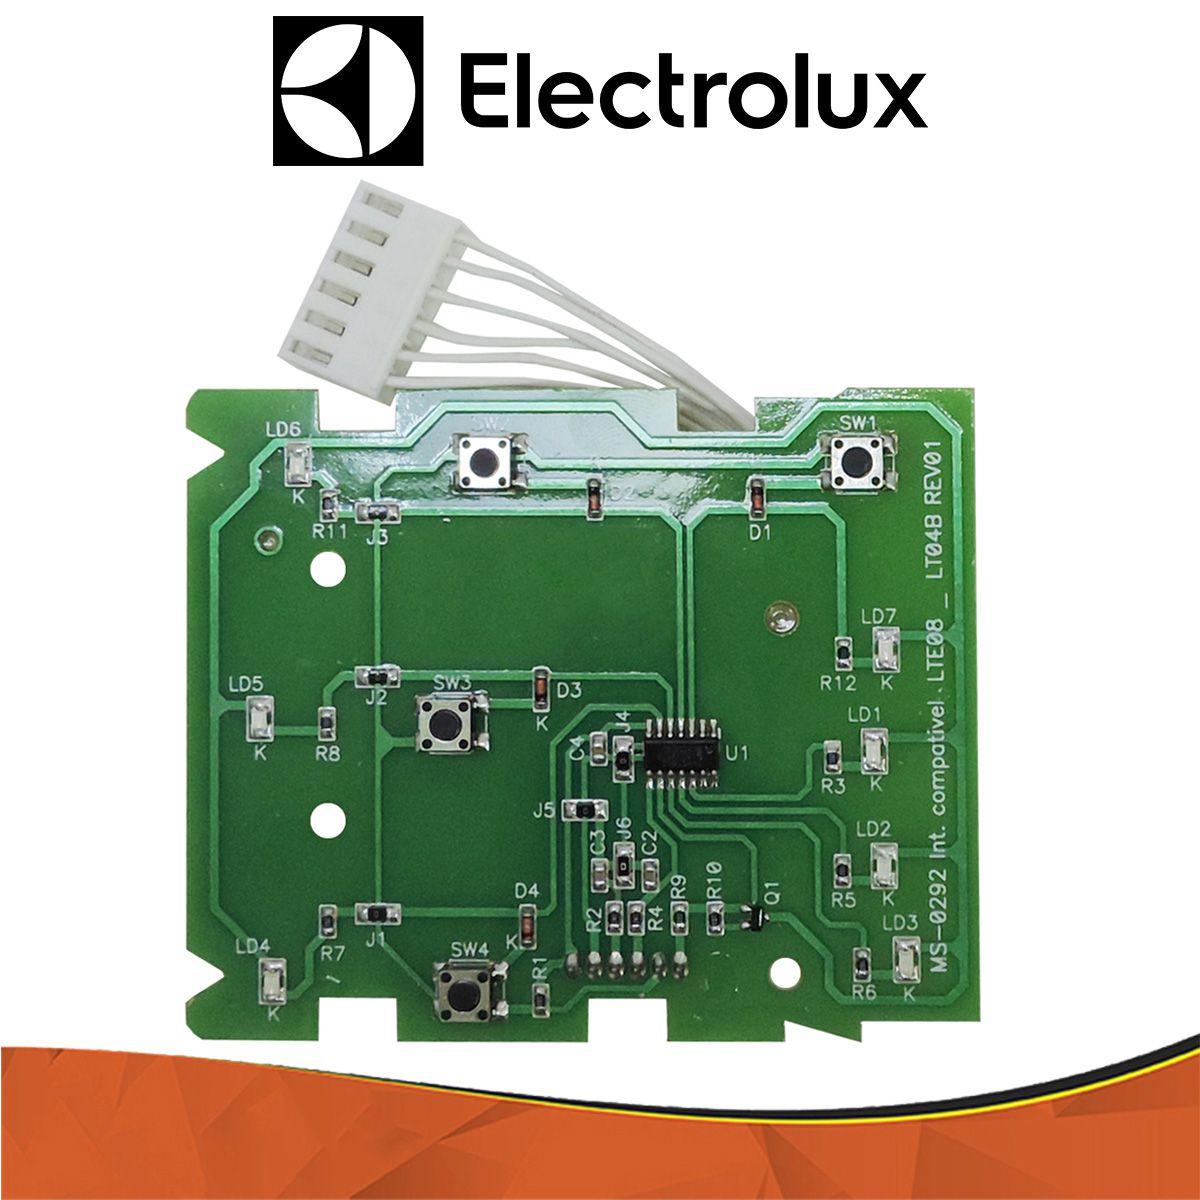 Placa Interface Compatível Electrolux Lte08 64500292 CDI